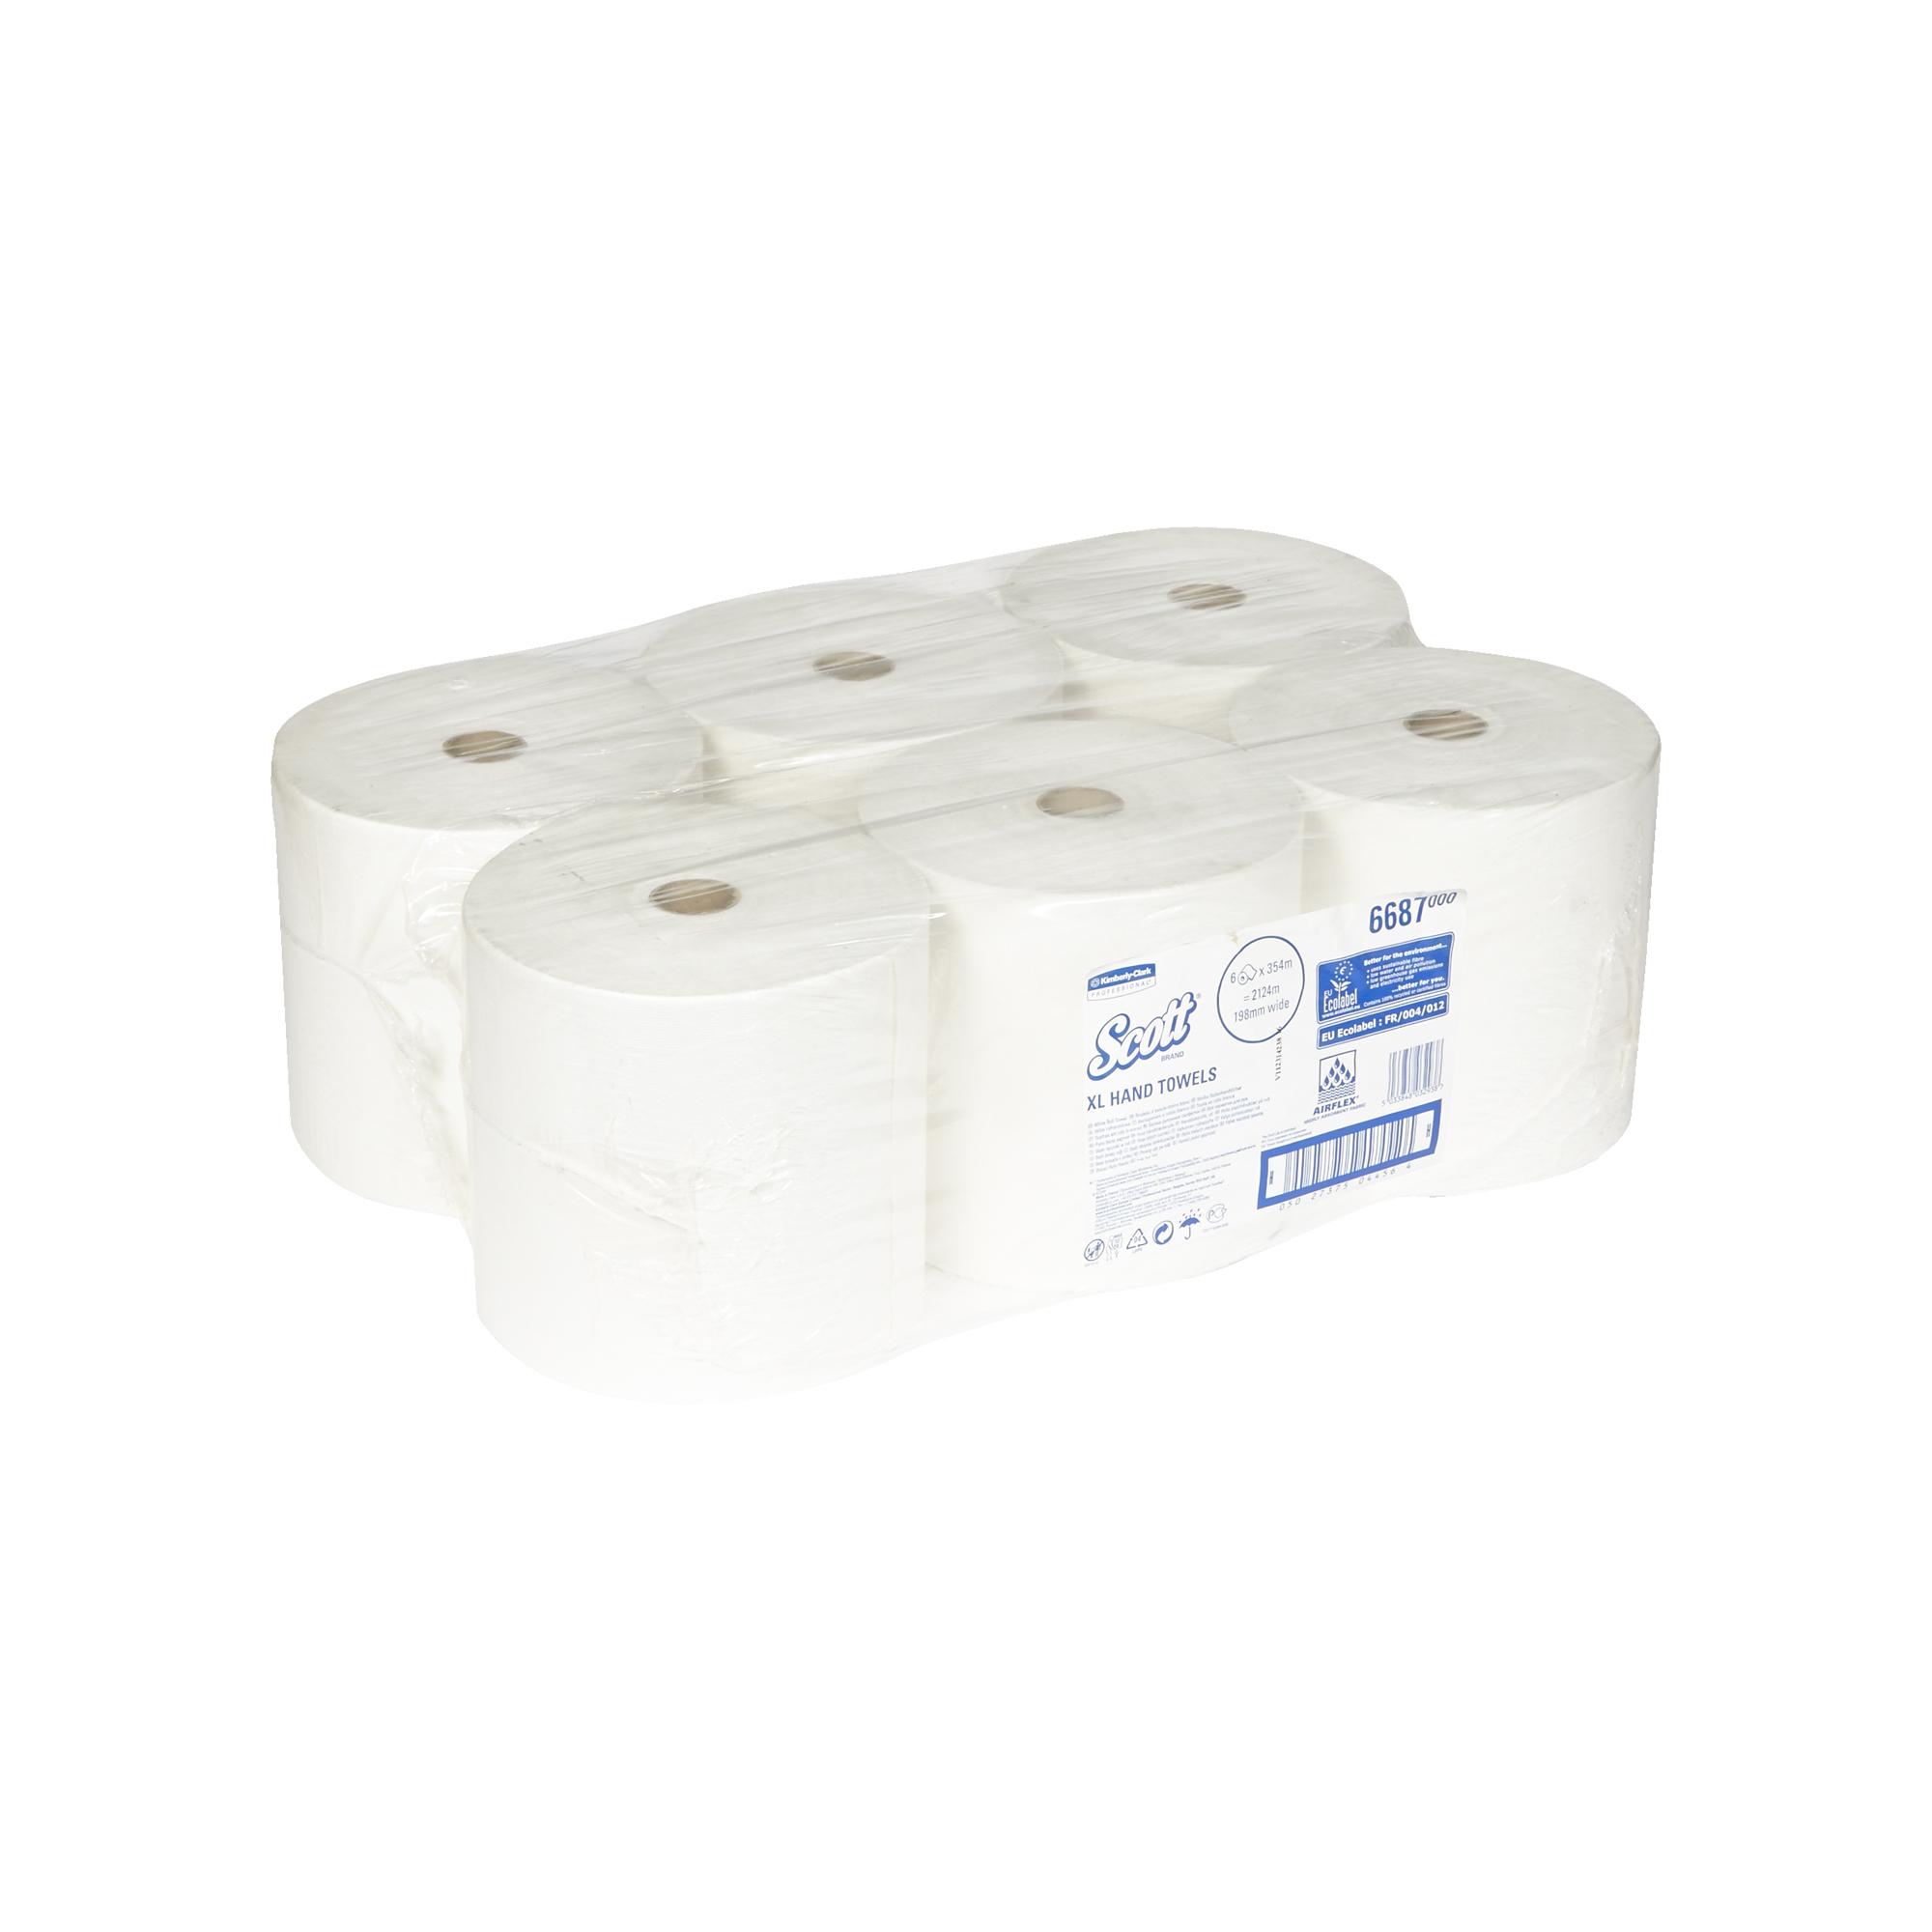 Kimberly-Clark® Rullkätepaber Matic Scott XL Airflex, 6tk kastis, 2-kihiline,  valge